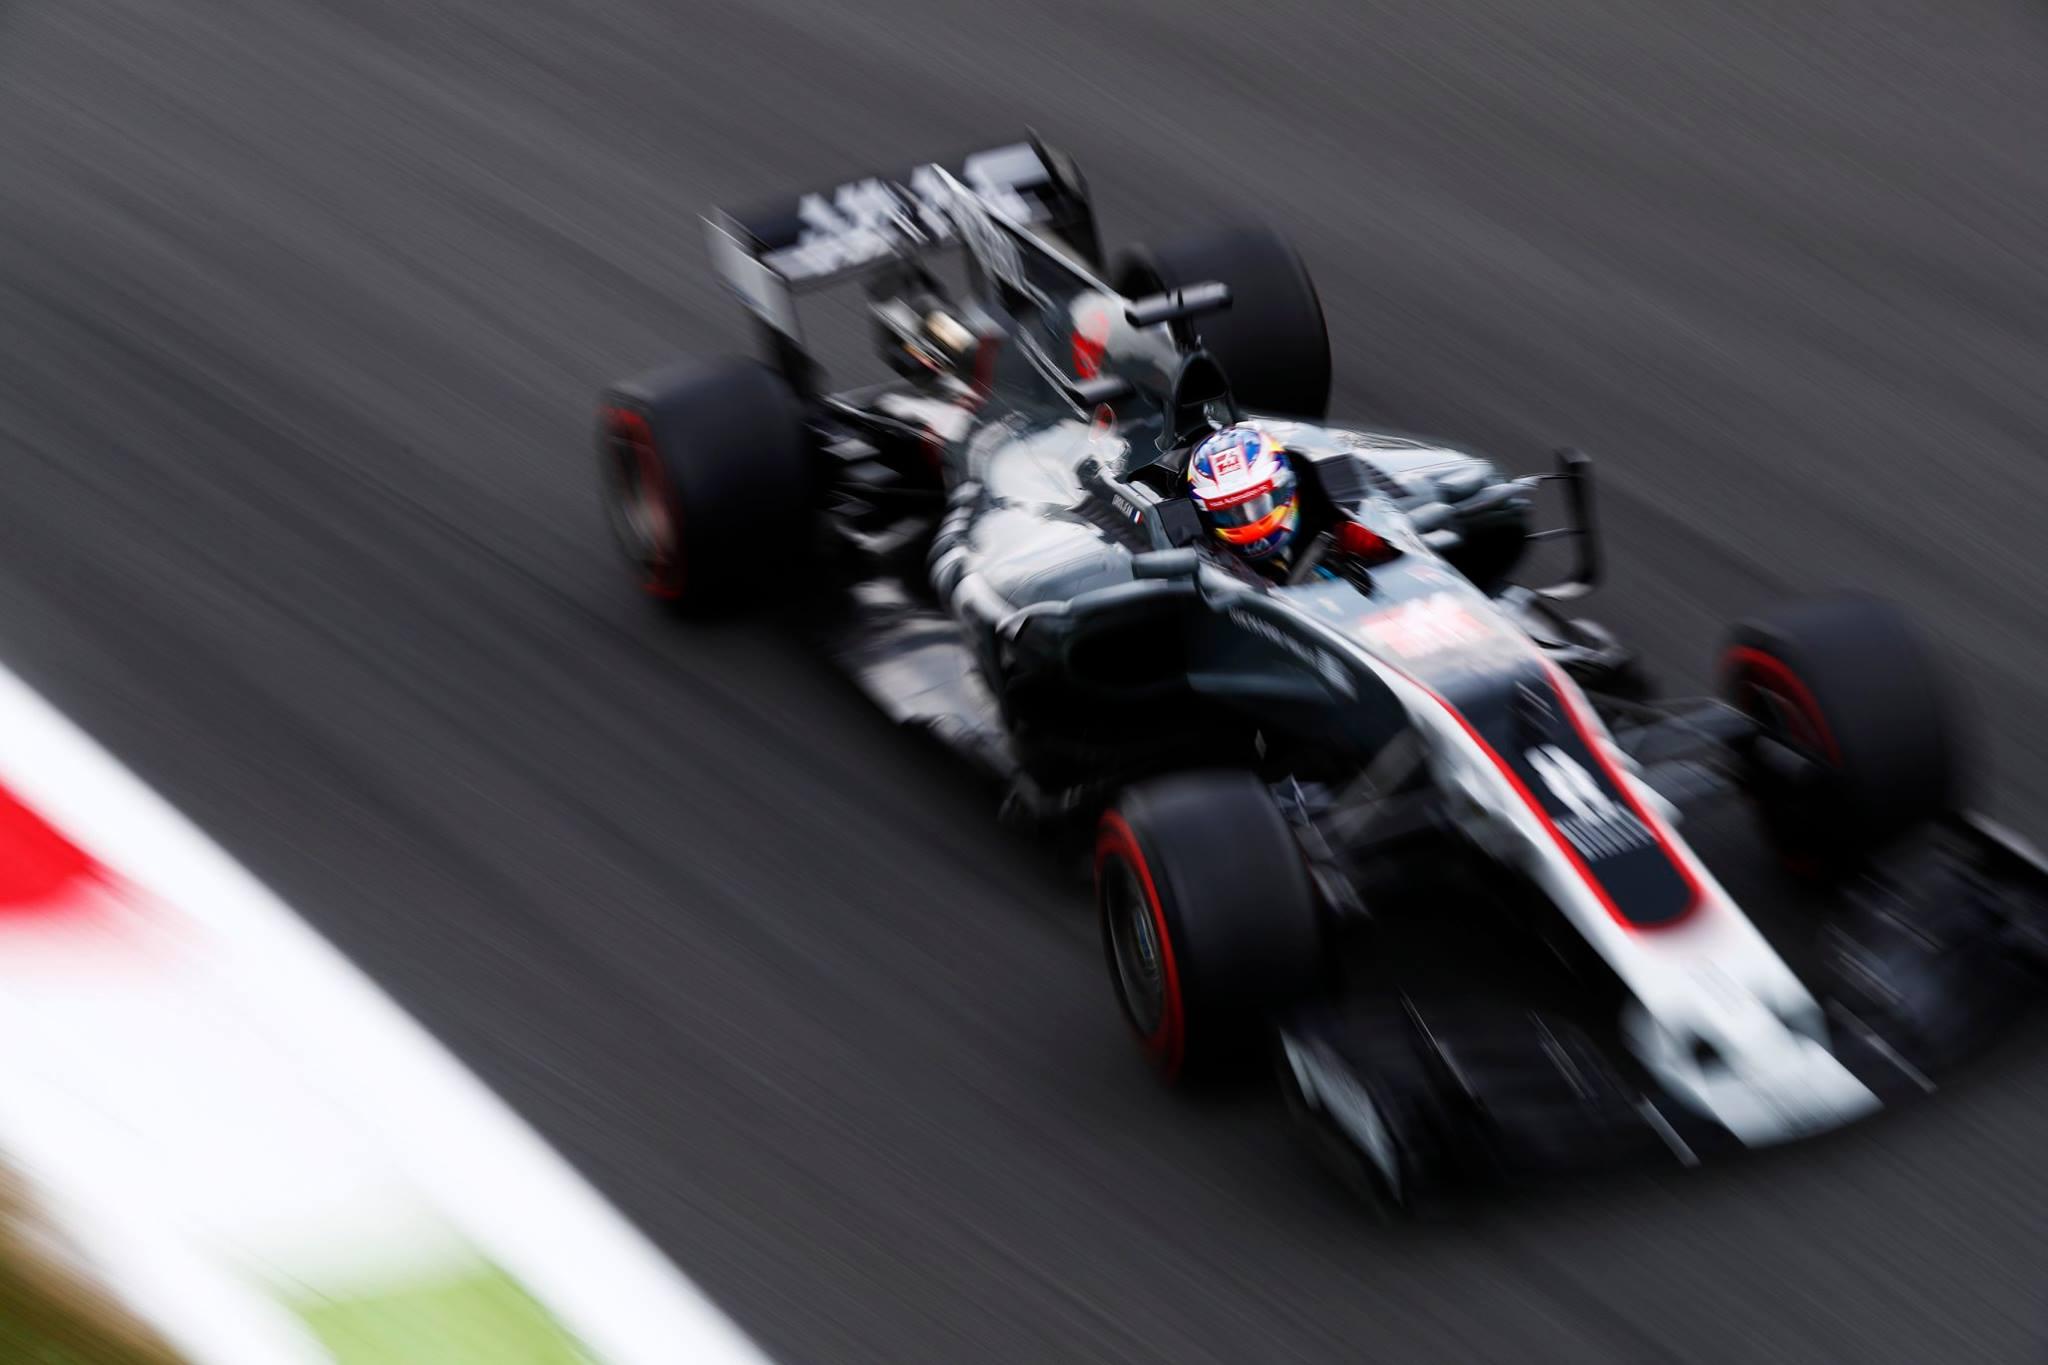 Haas F1 car owned by Gene Haas